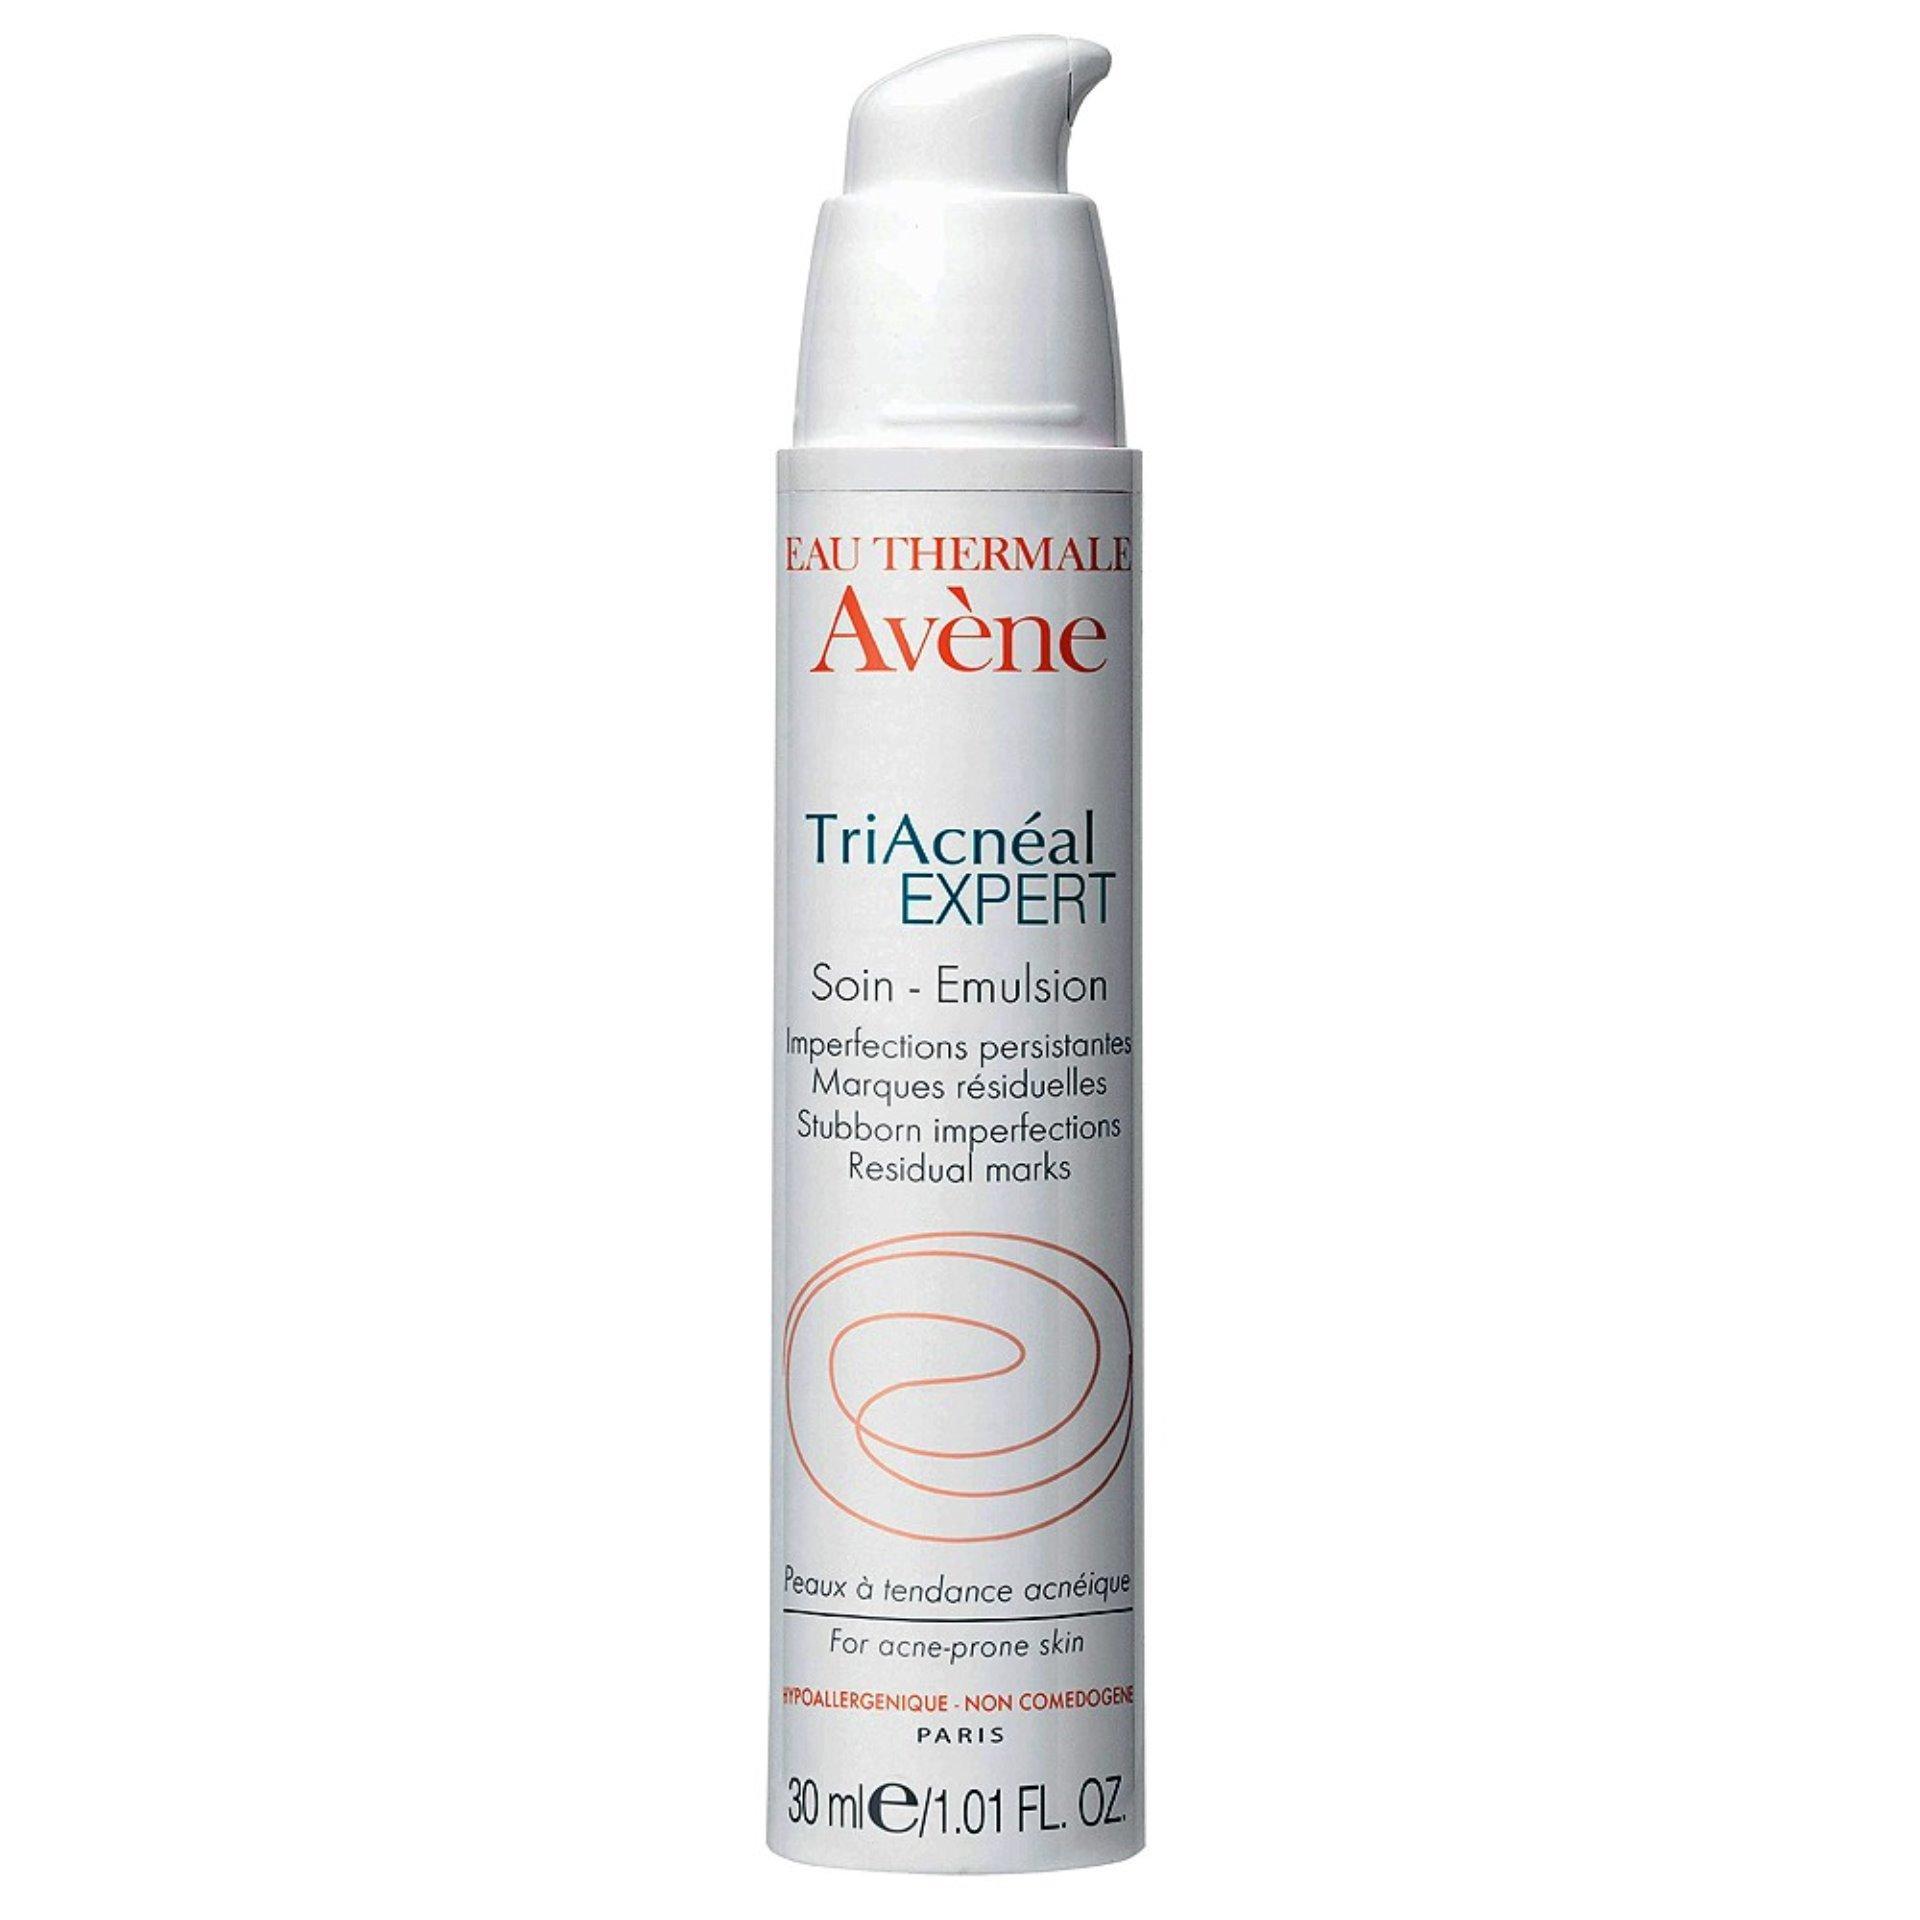 Avene Triacneal Fast Anti Pimple Drying Formula